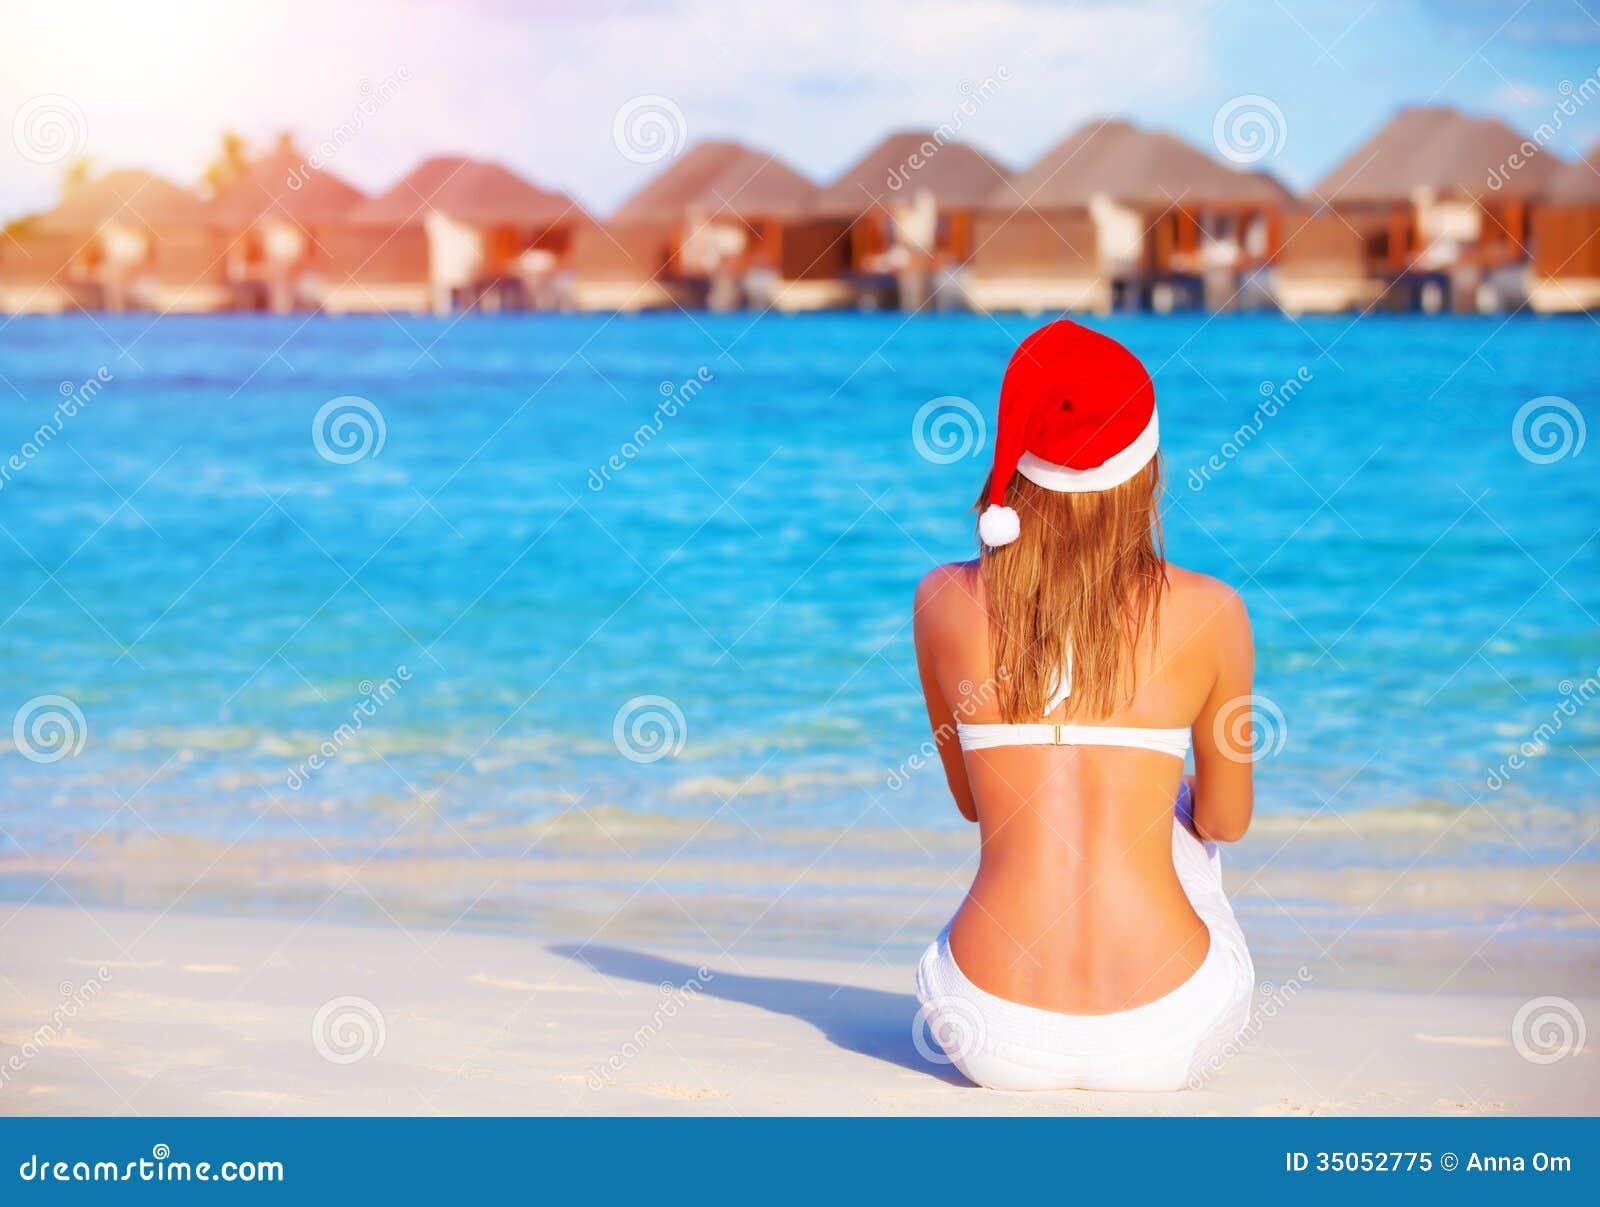 New Year celebration on Maldives, travel on winter holidays to summer ...